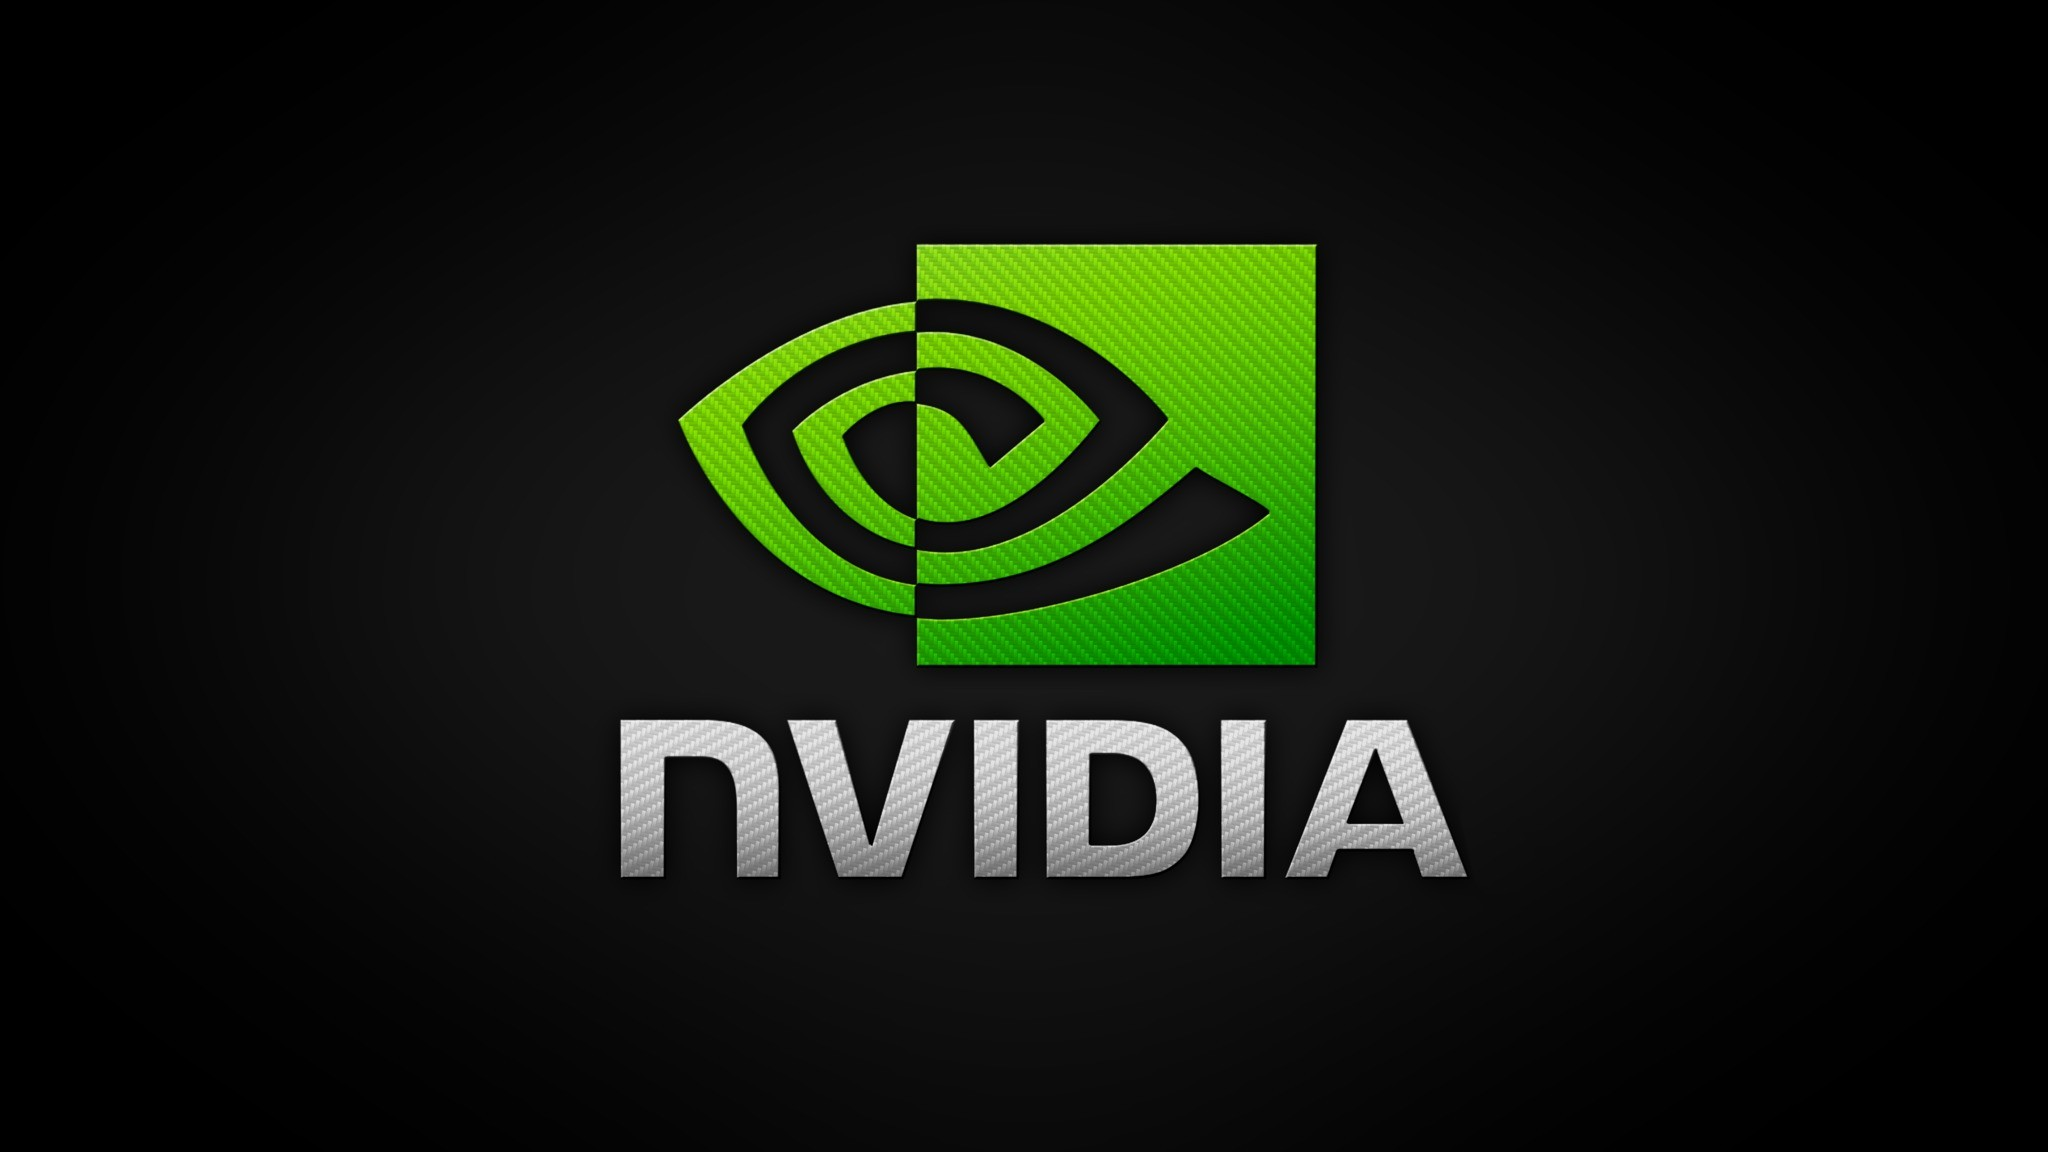 nvidia-brand-logo-2.jpg